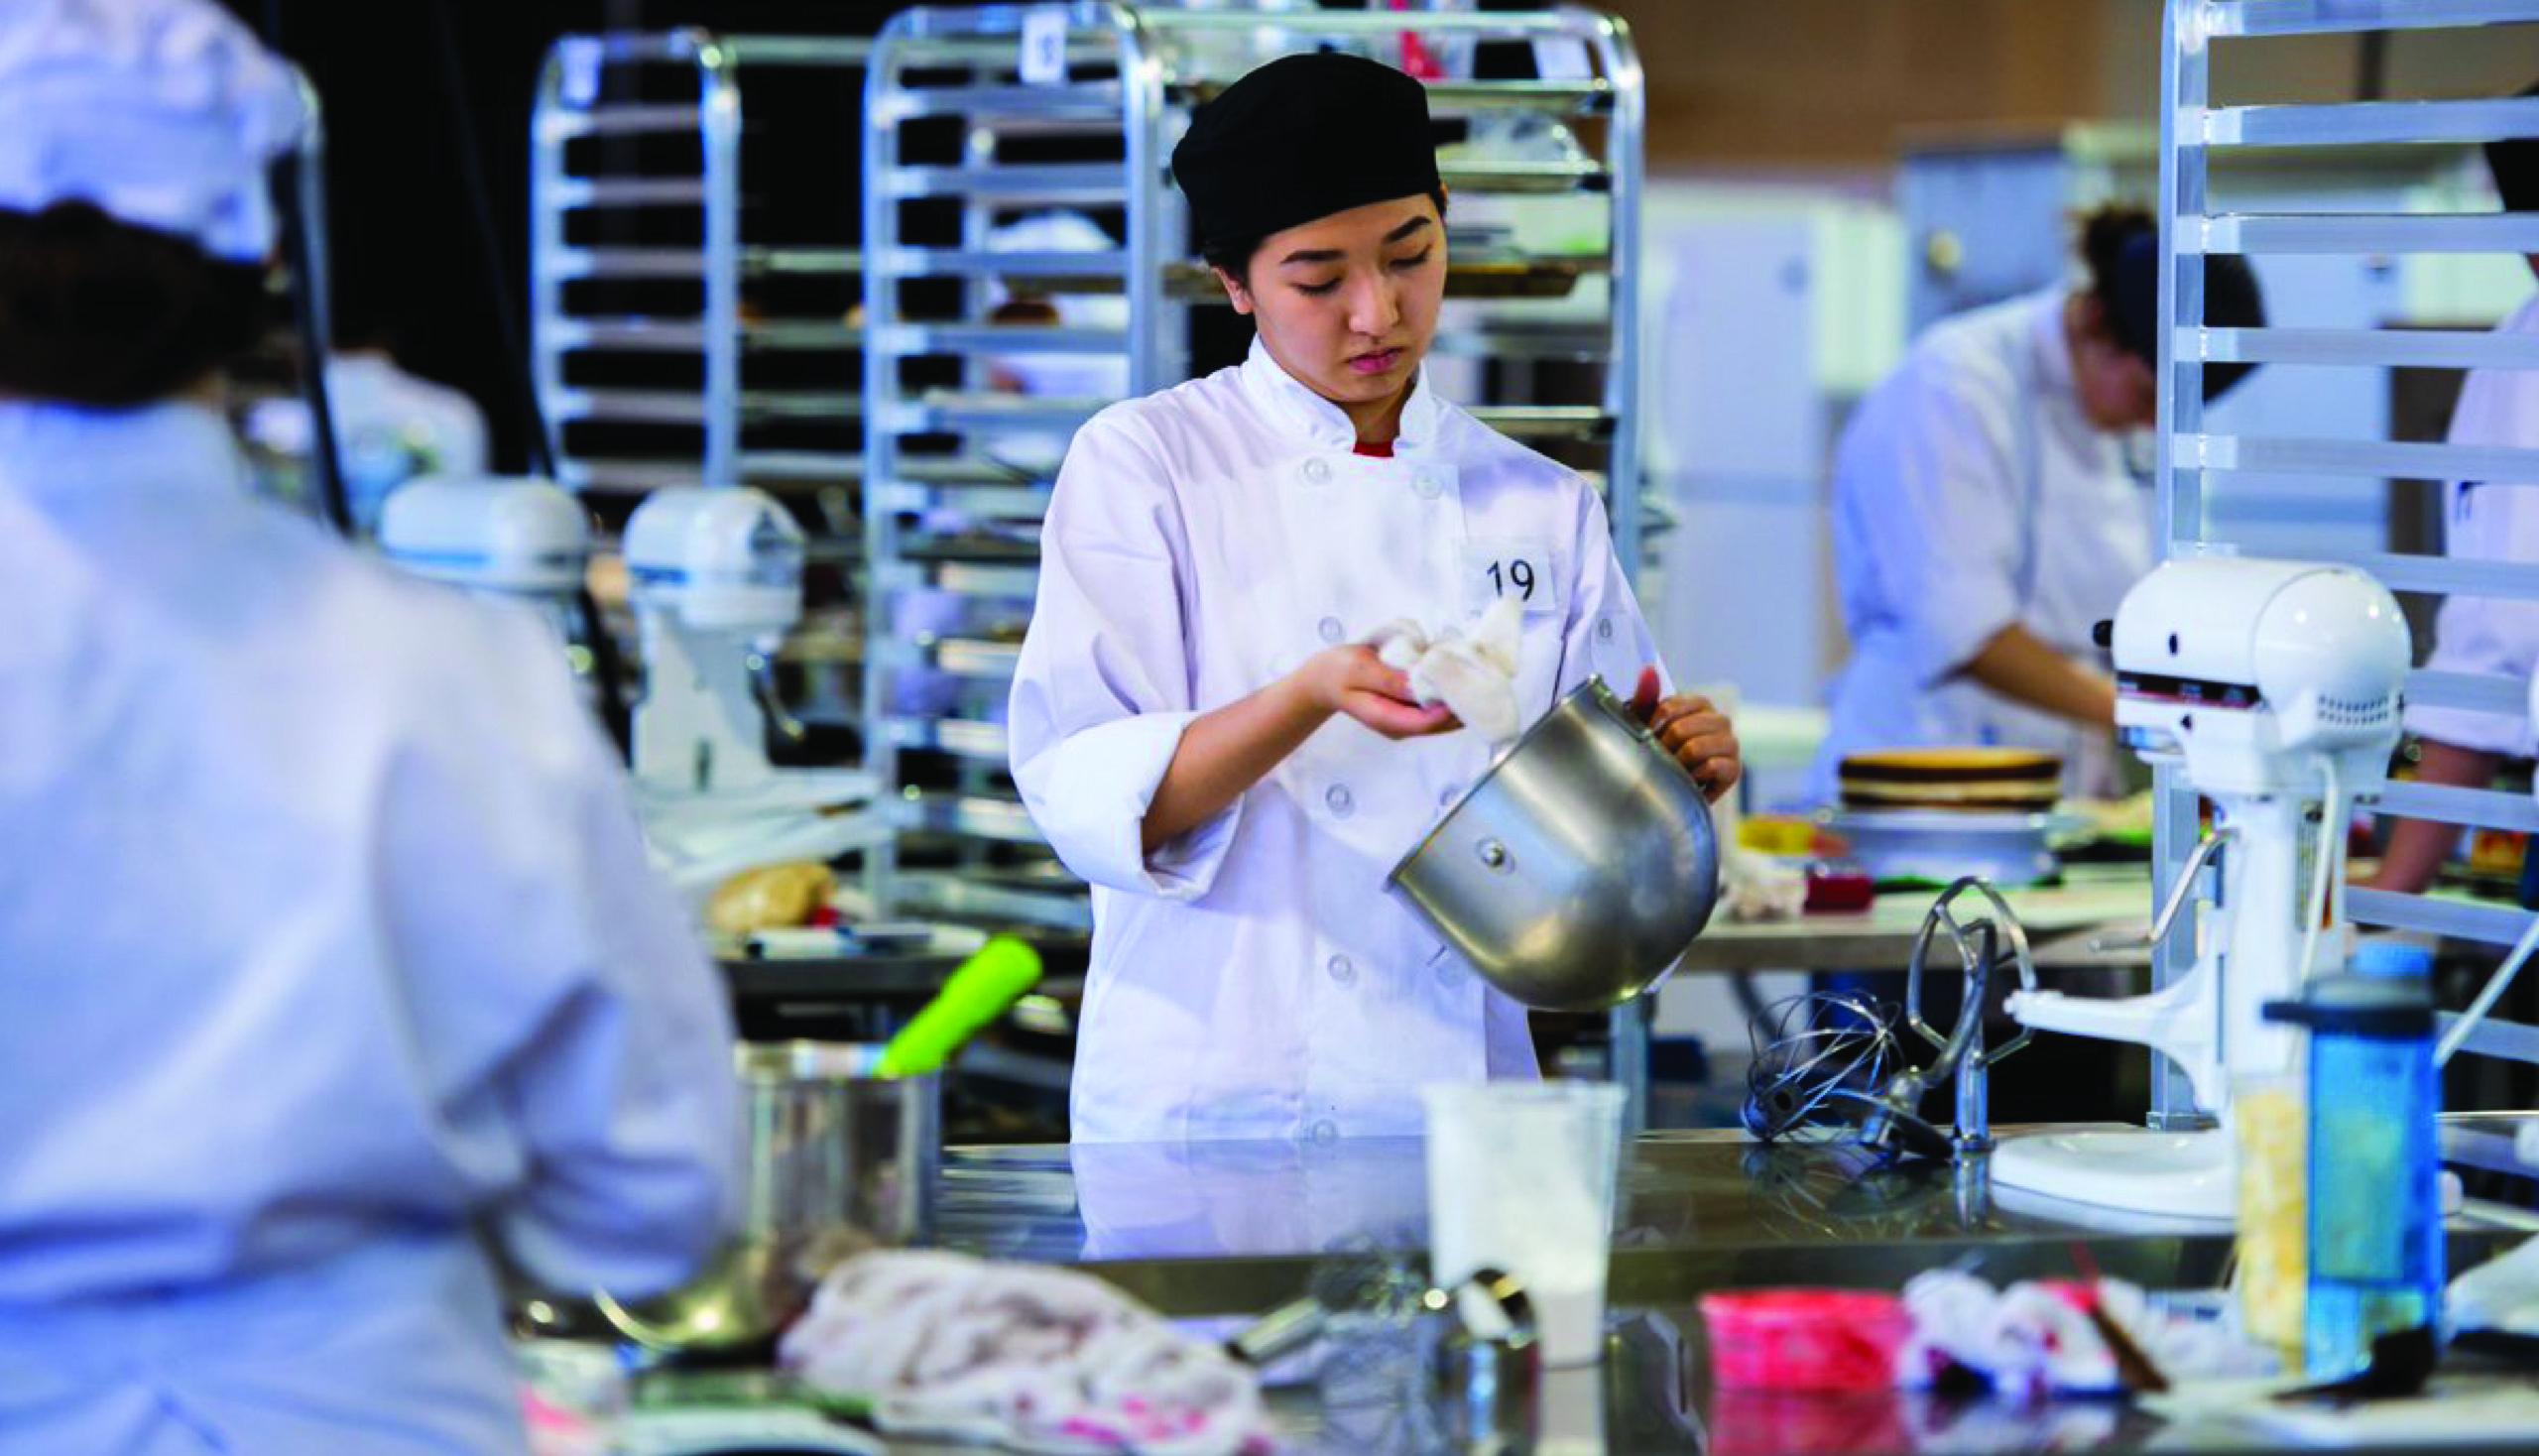 Diploma in Culinary Arts